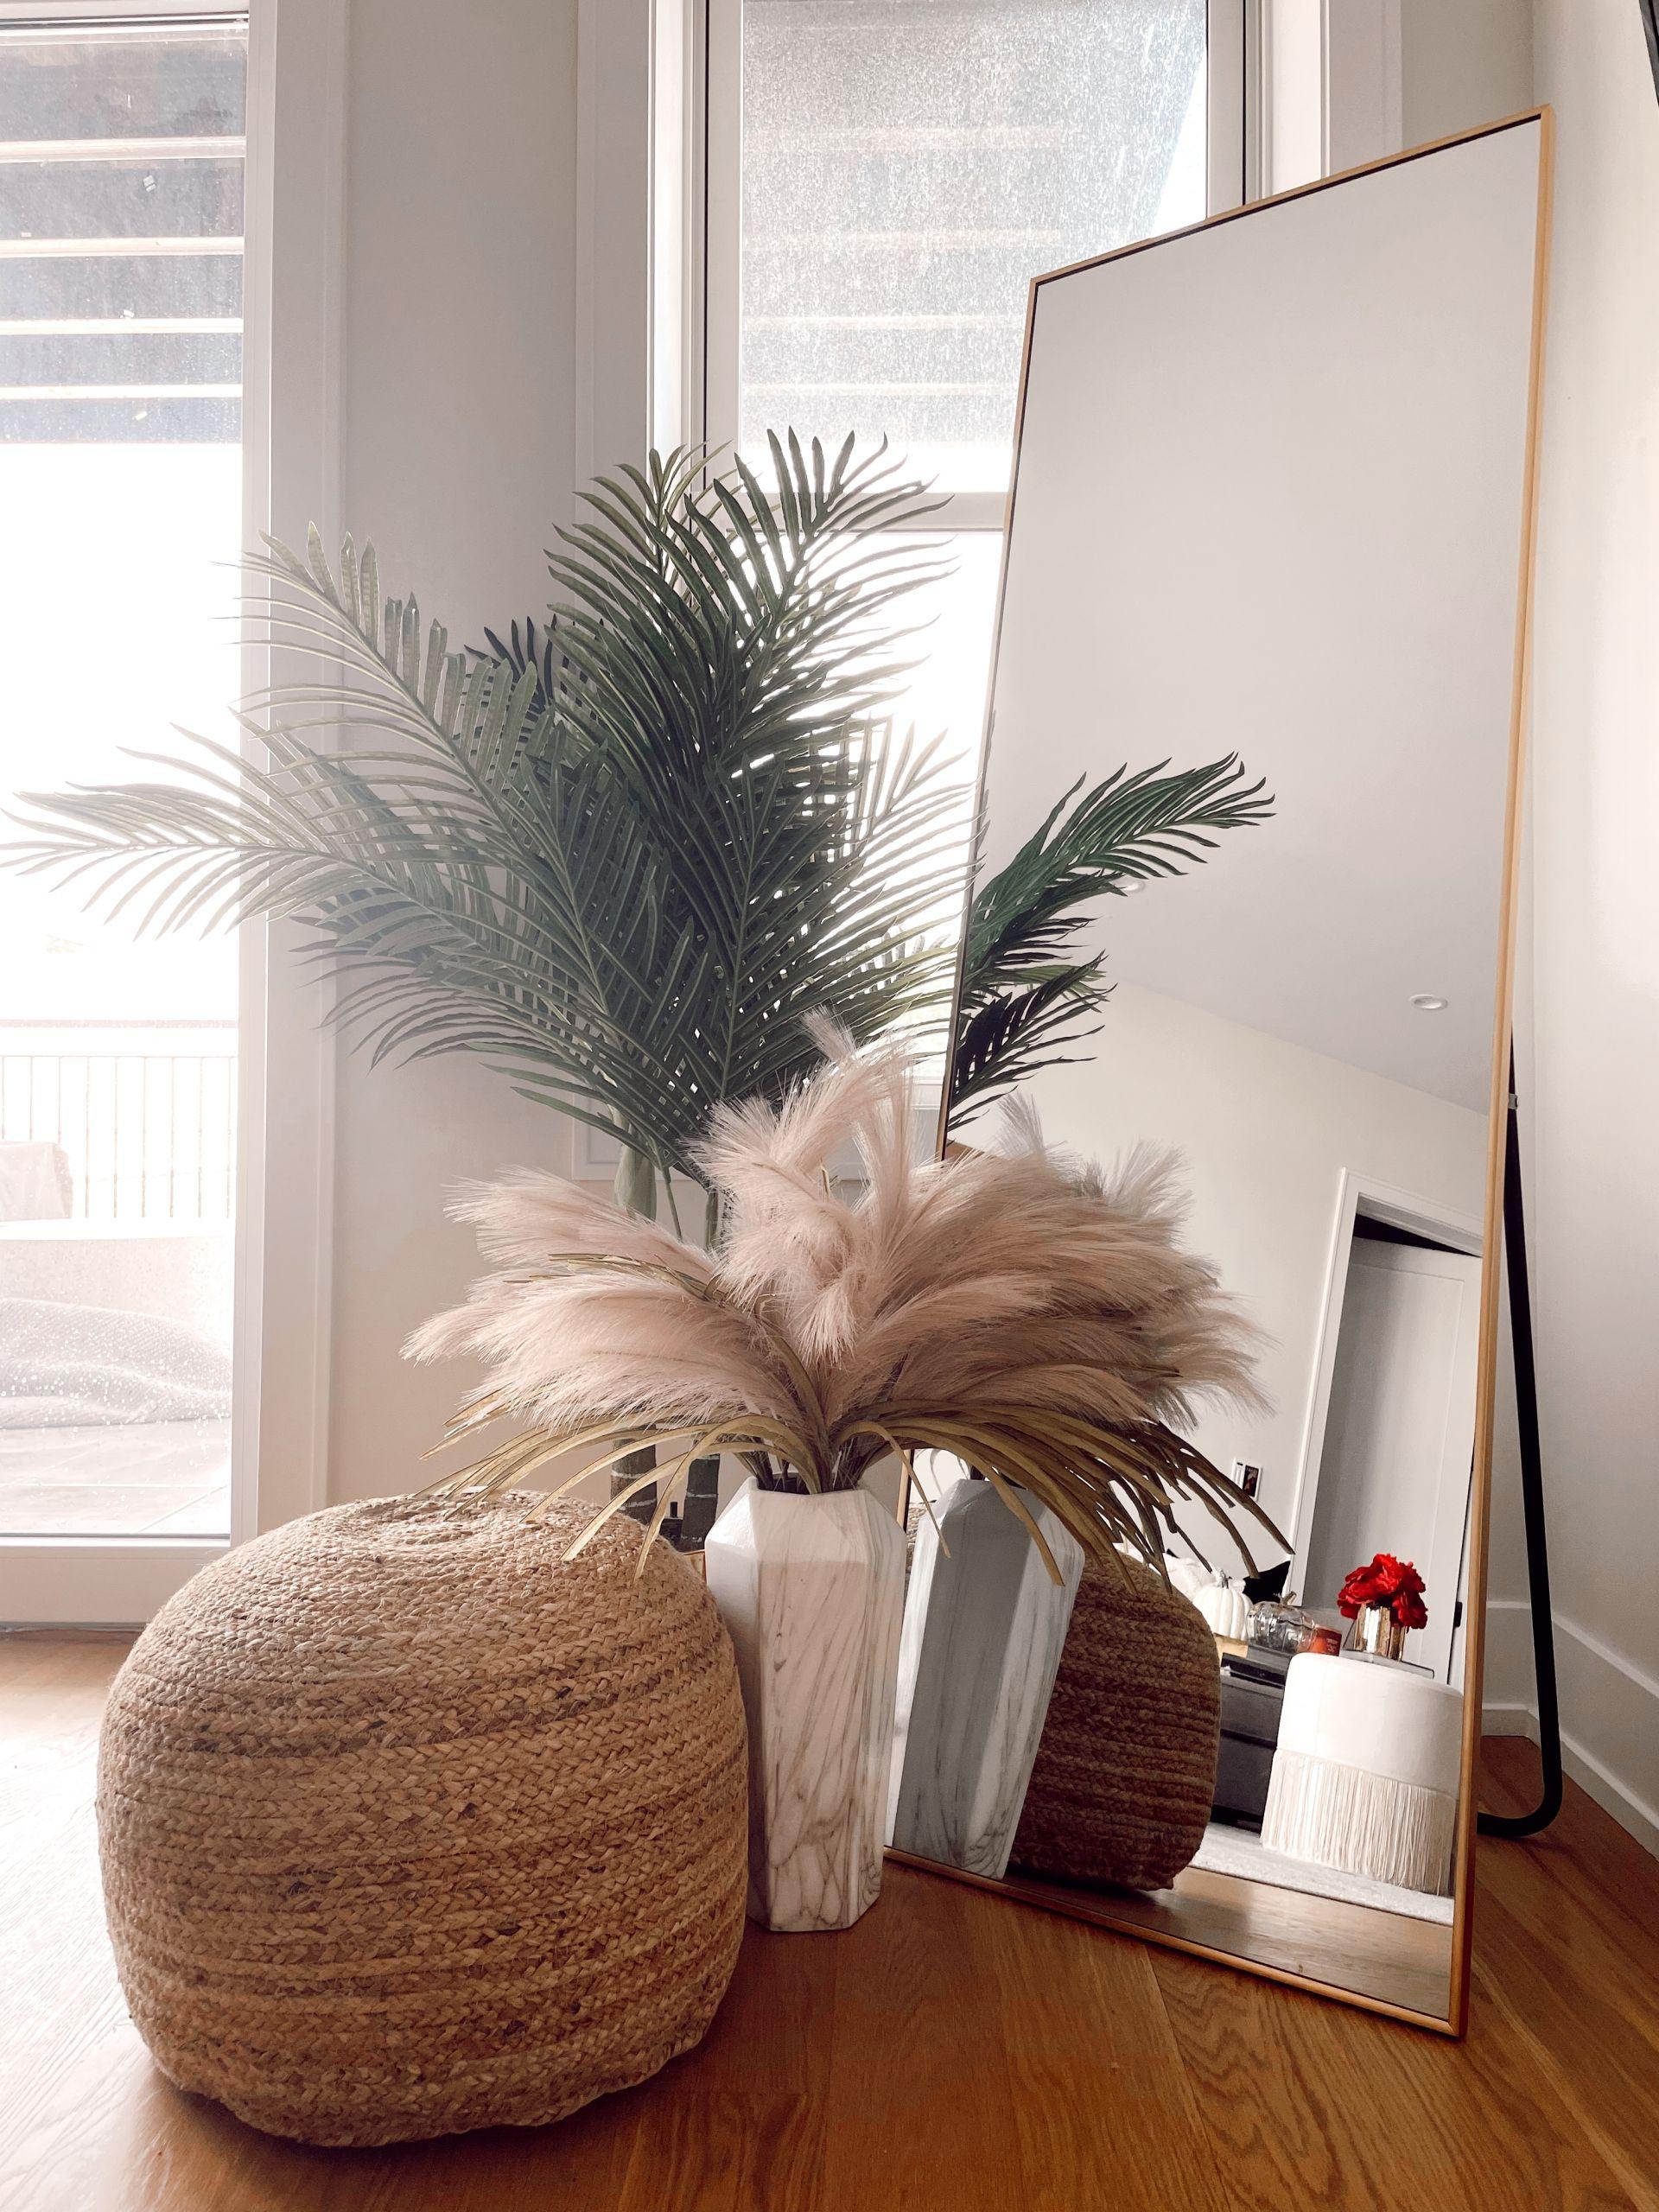 pampas grass inspiration, pampas grass styling, pampas grass living room, pampas grass mirror ideas, gold mirror styling, jute pouf, boho neutral pouf, floor mirror styling ideas